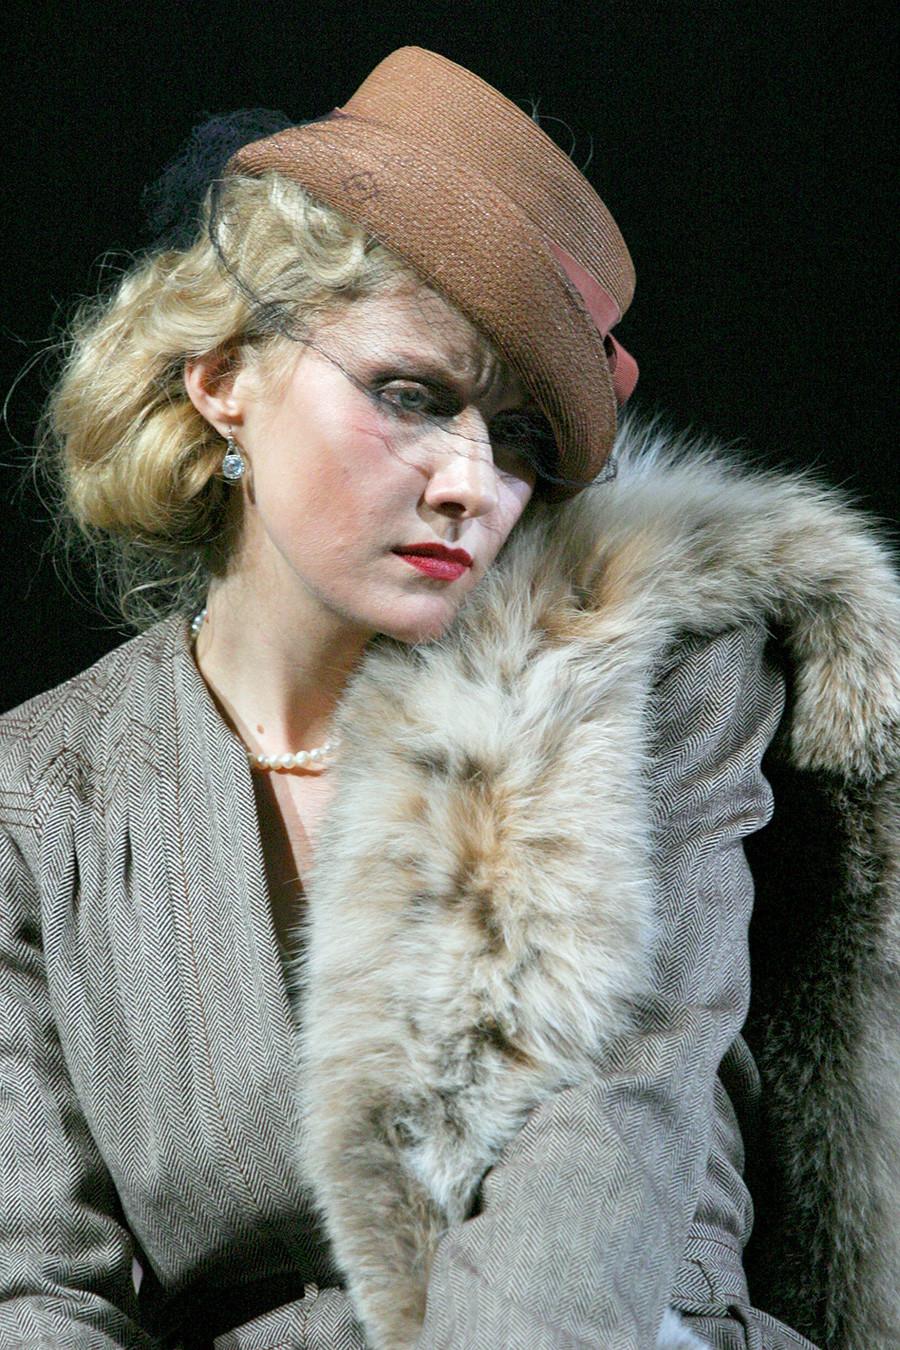 Renata Litvinova as Lyubov Ranevskaya in 'The Cherry Orchard' staged at the Moscow Art Theater.